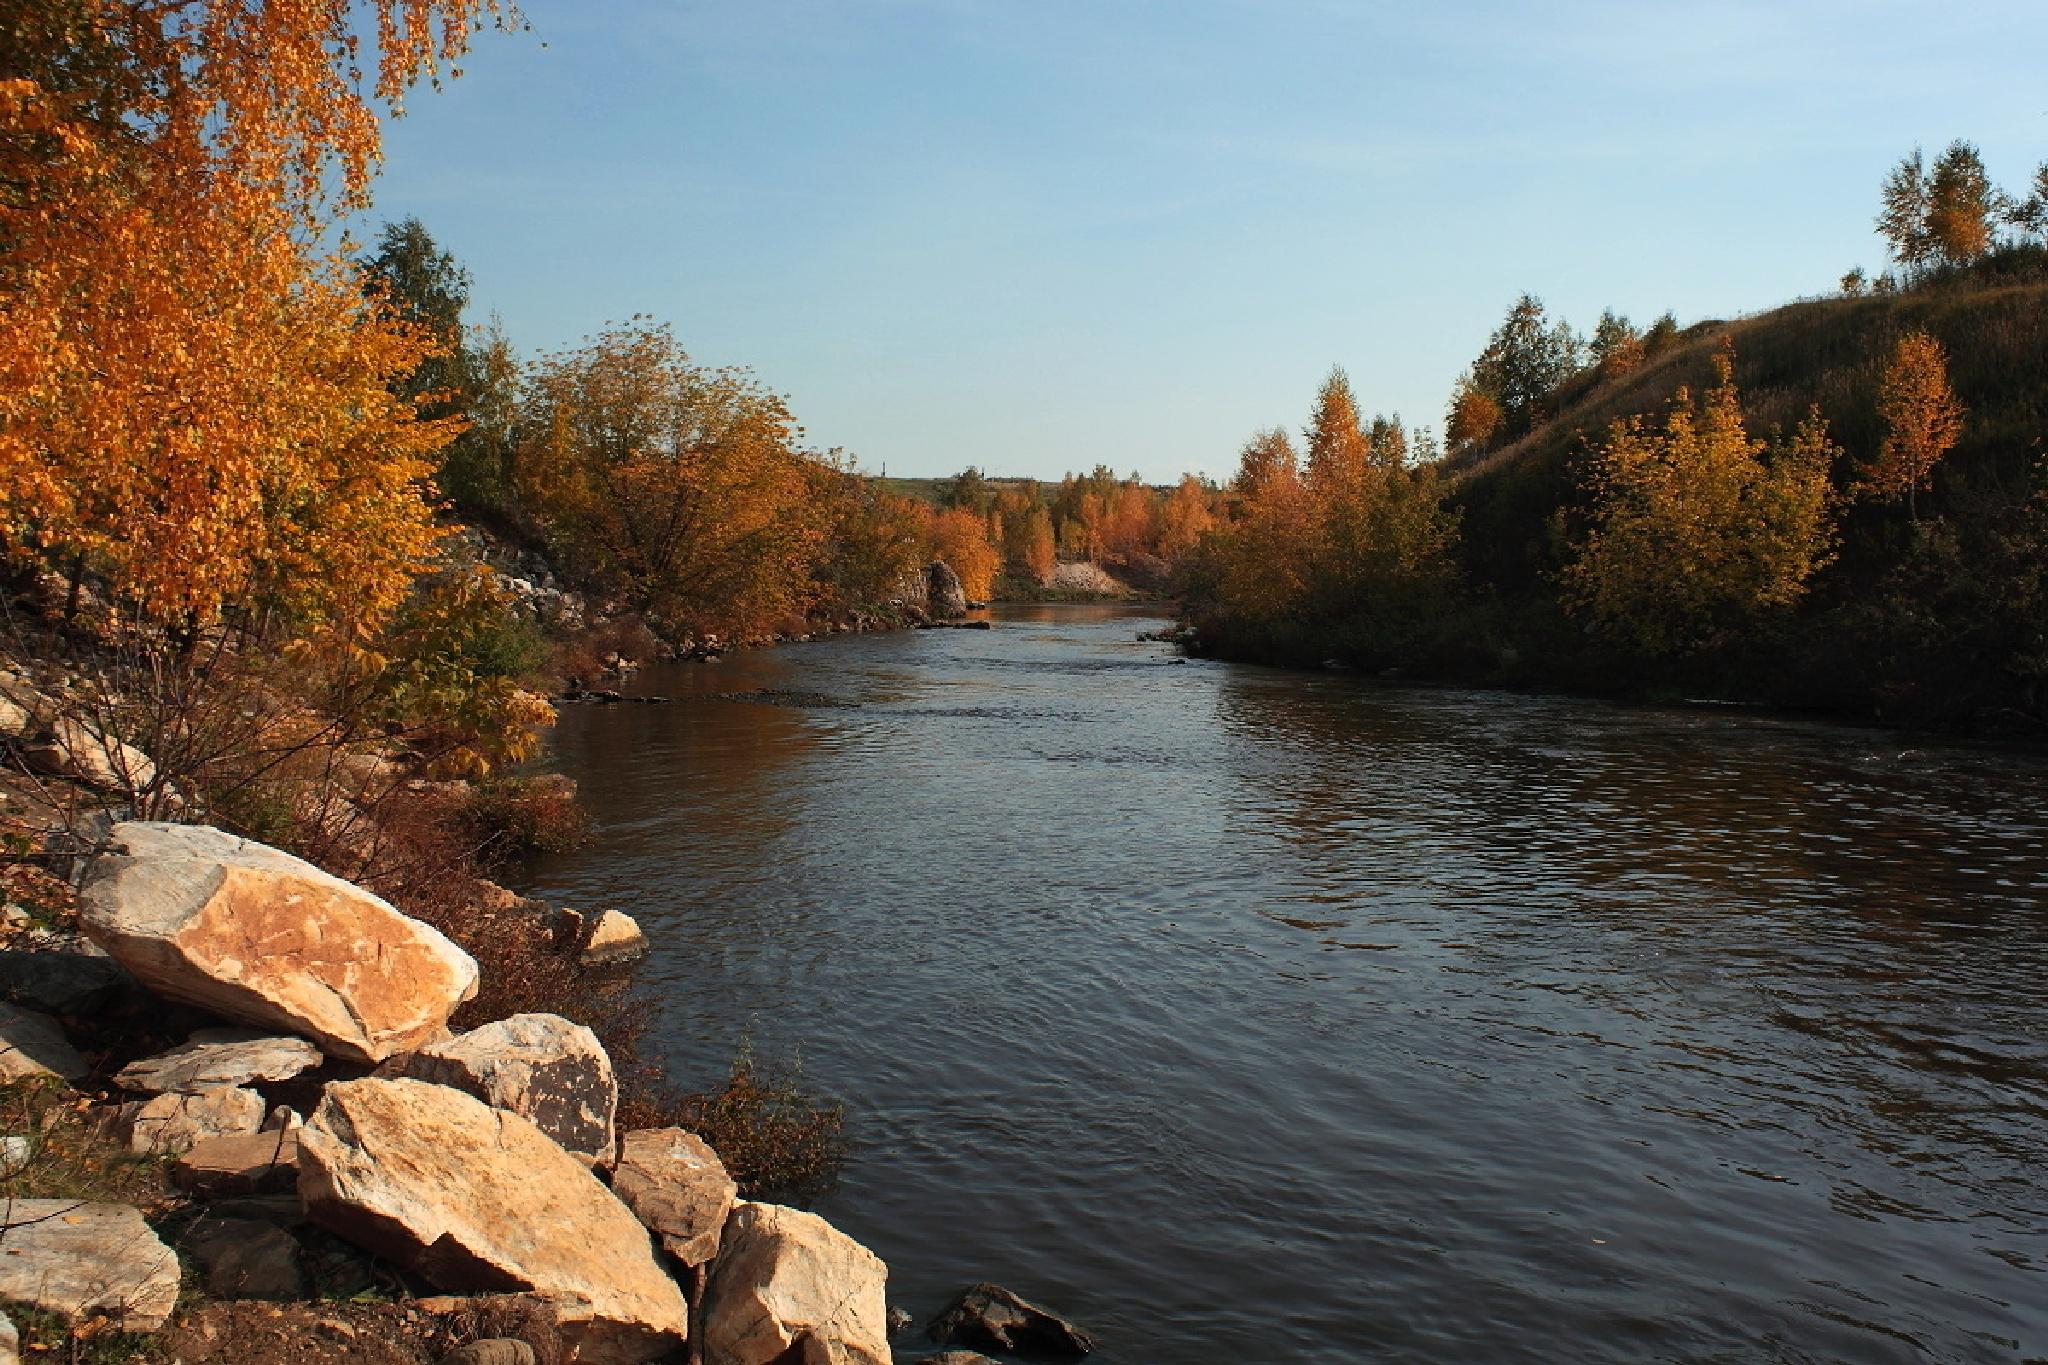 autumn river by Alexey Komarov